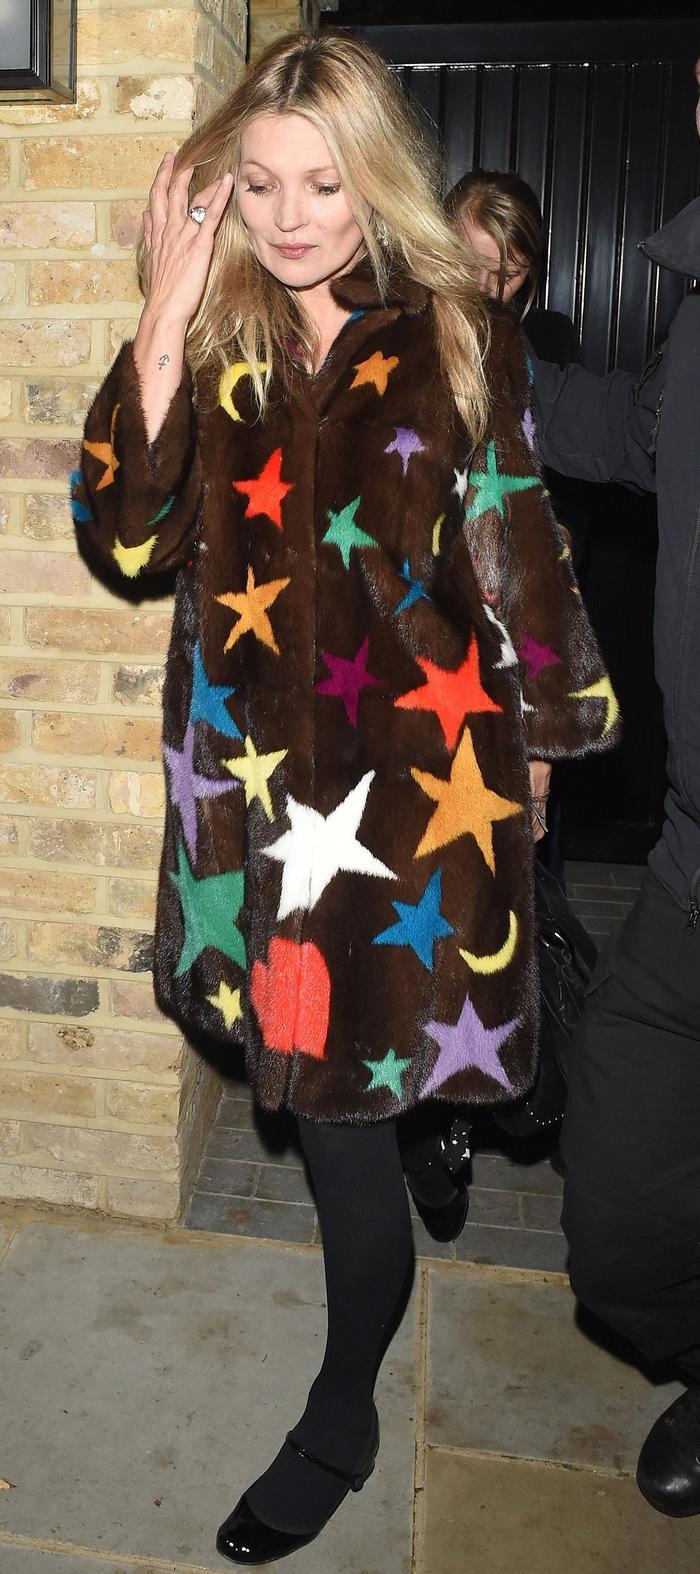 Kate Moss Gucci Pre-Fall Starry Fur Coat London